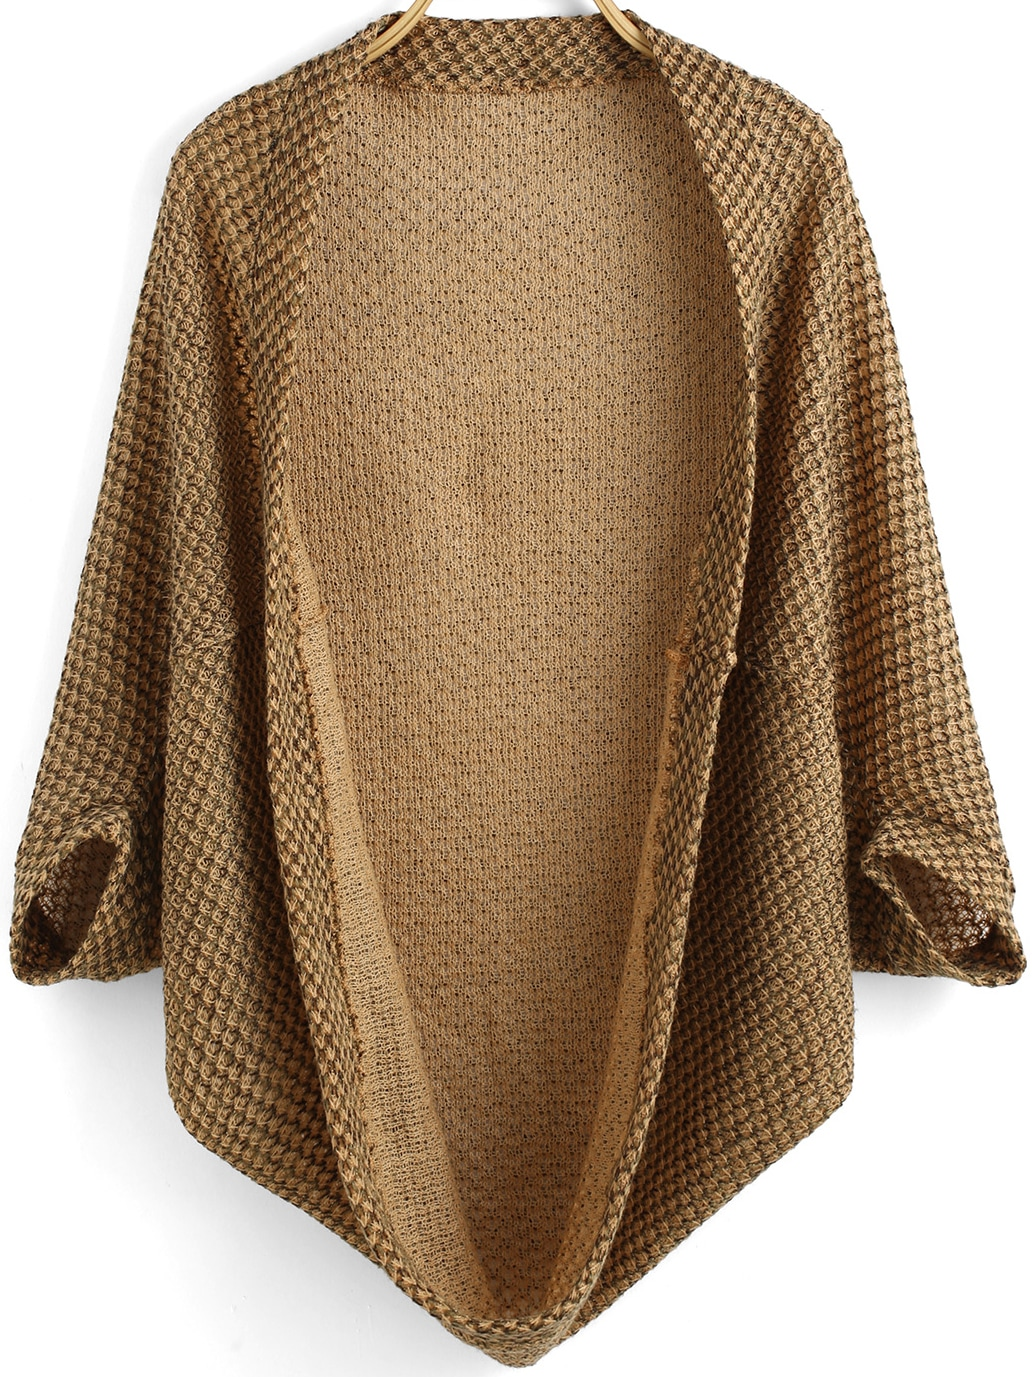 Cape Cardigan Knitting Pattern : Green Batwing Sleeve Knit Cape Cardigan -SheIn(Sheinside)